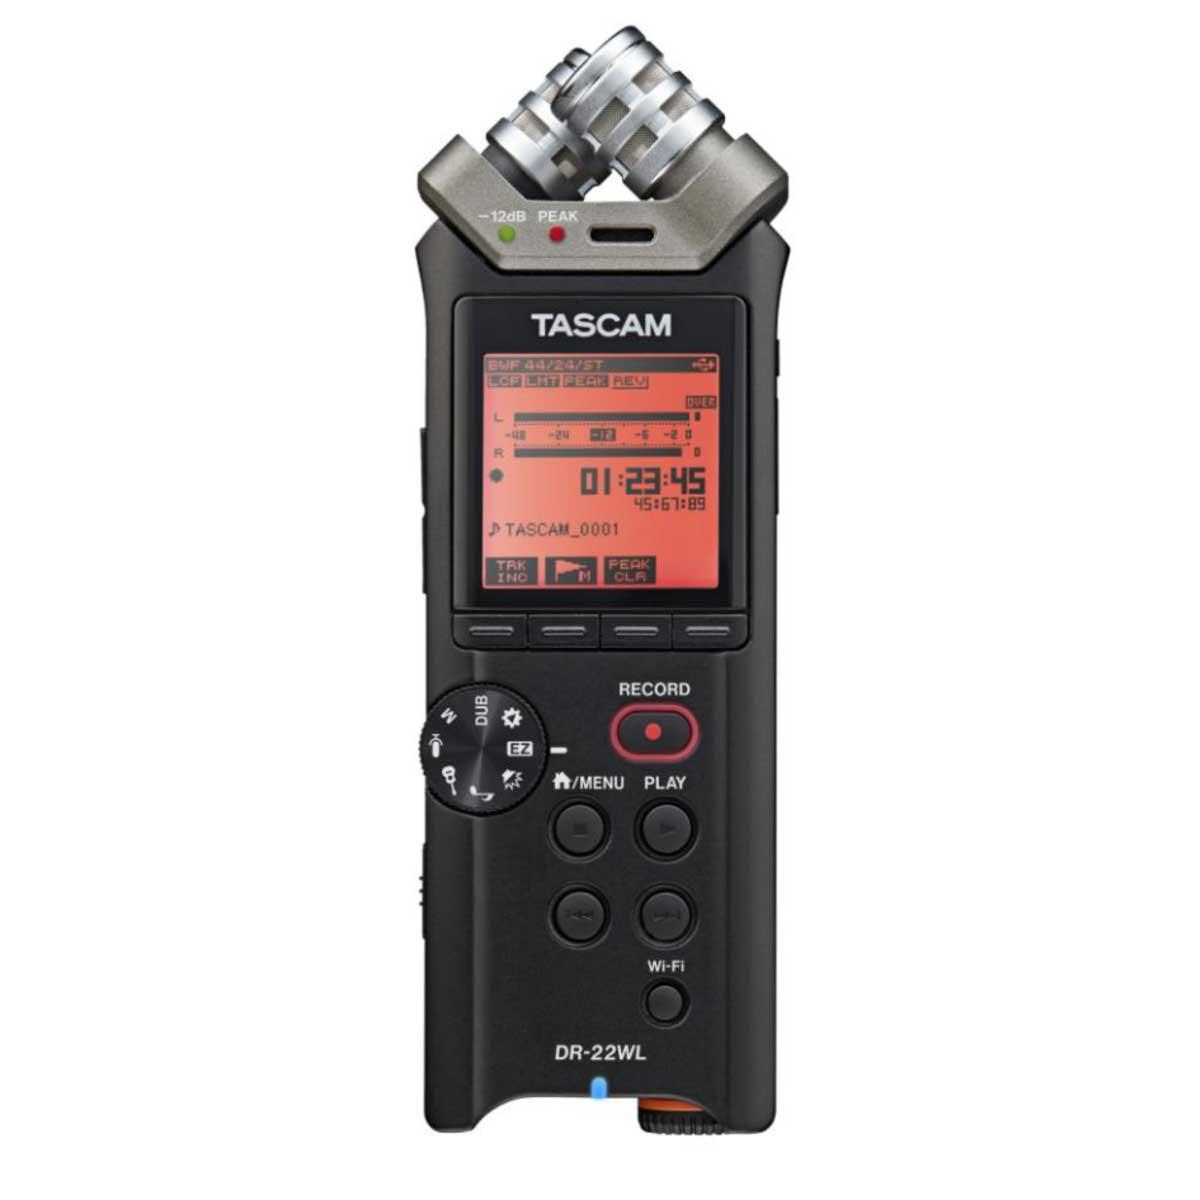 TASCAM タスカム / DR-22WL VER2-J モバイルレコーダー【お取り寄せ商品】